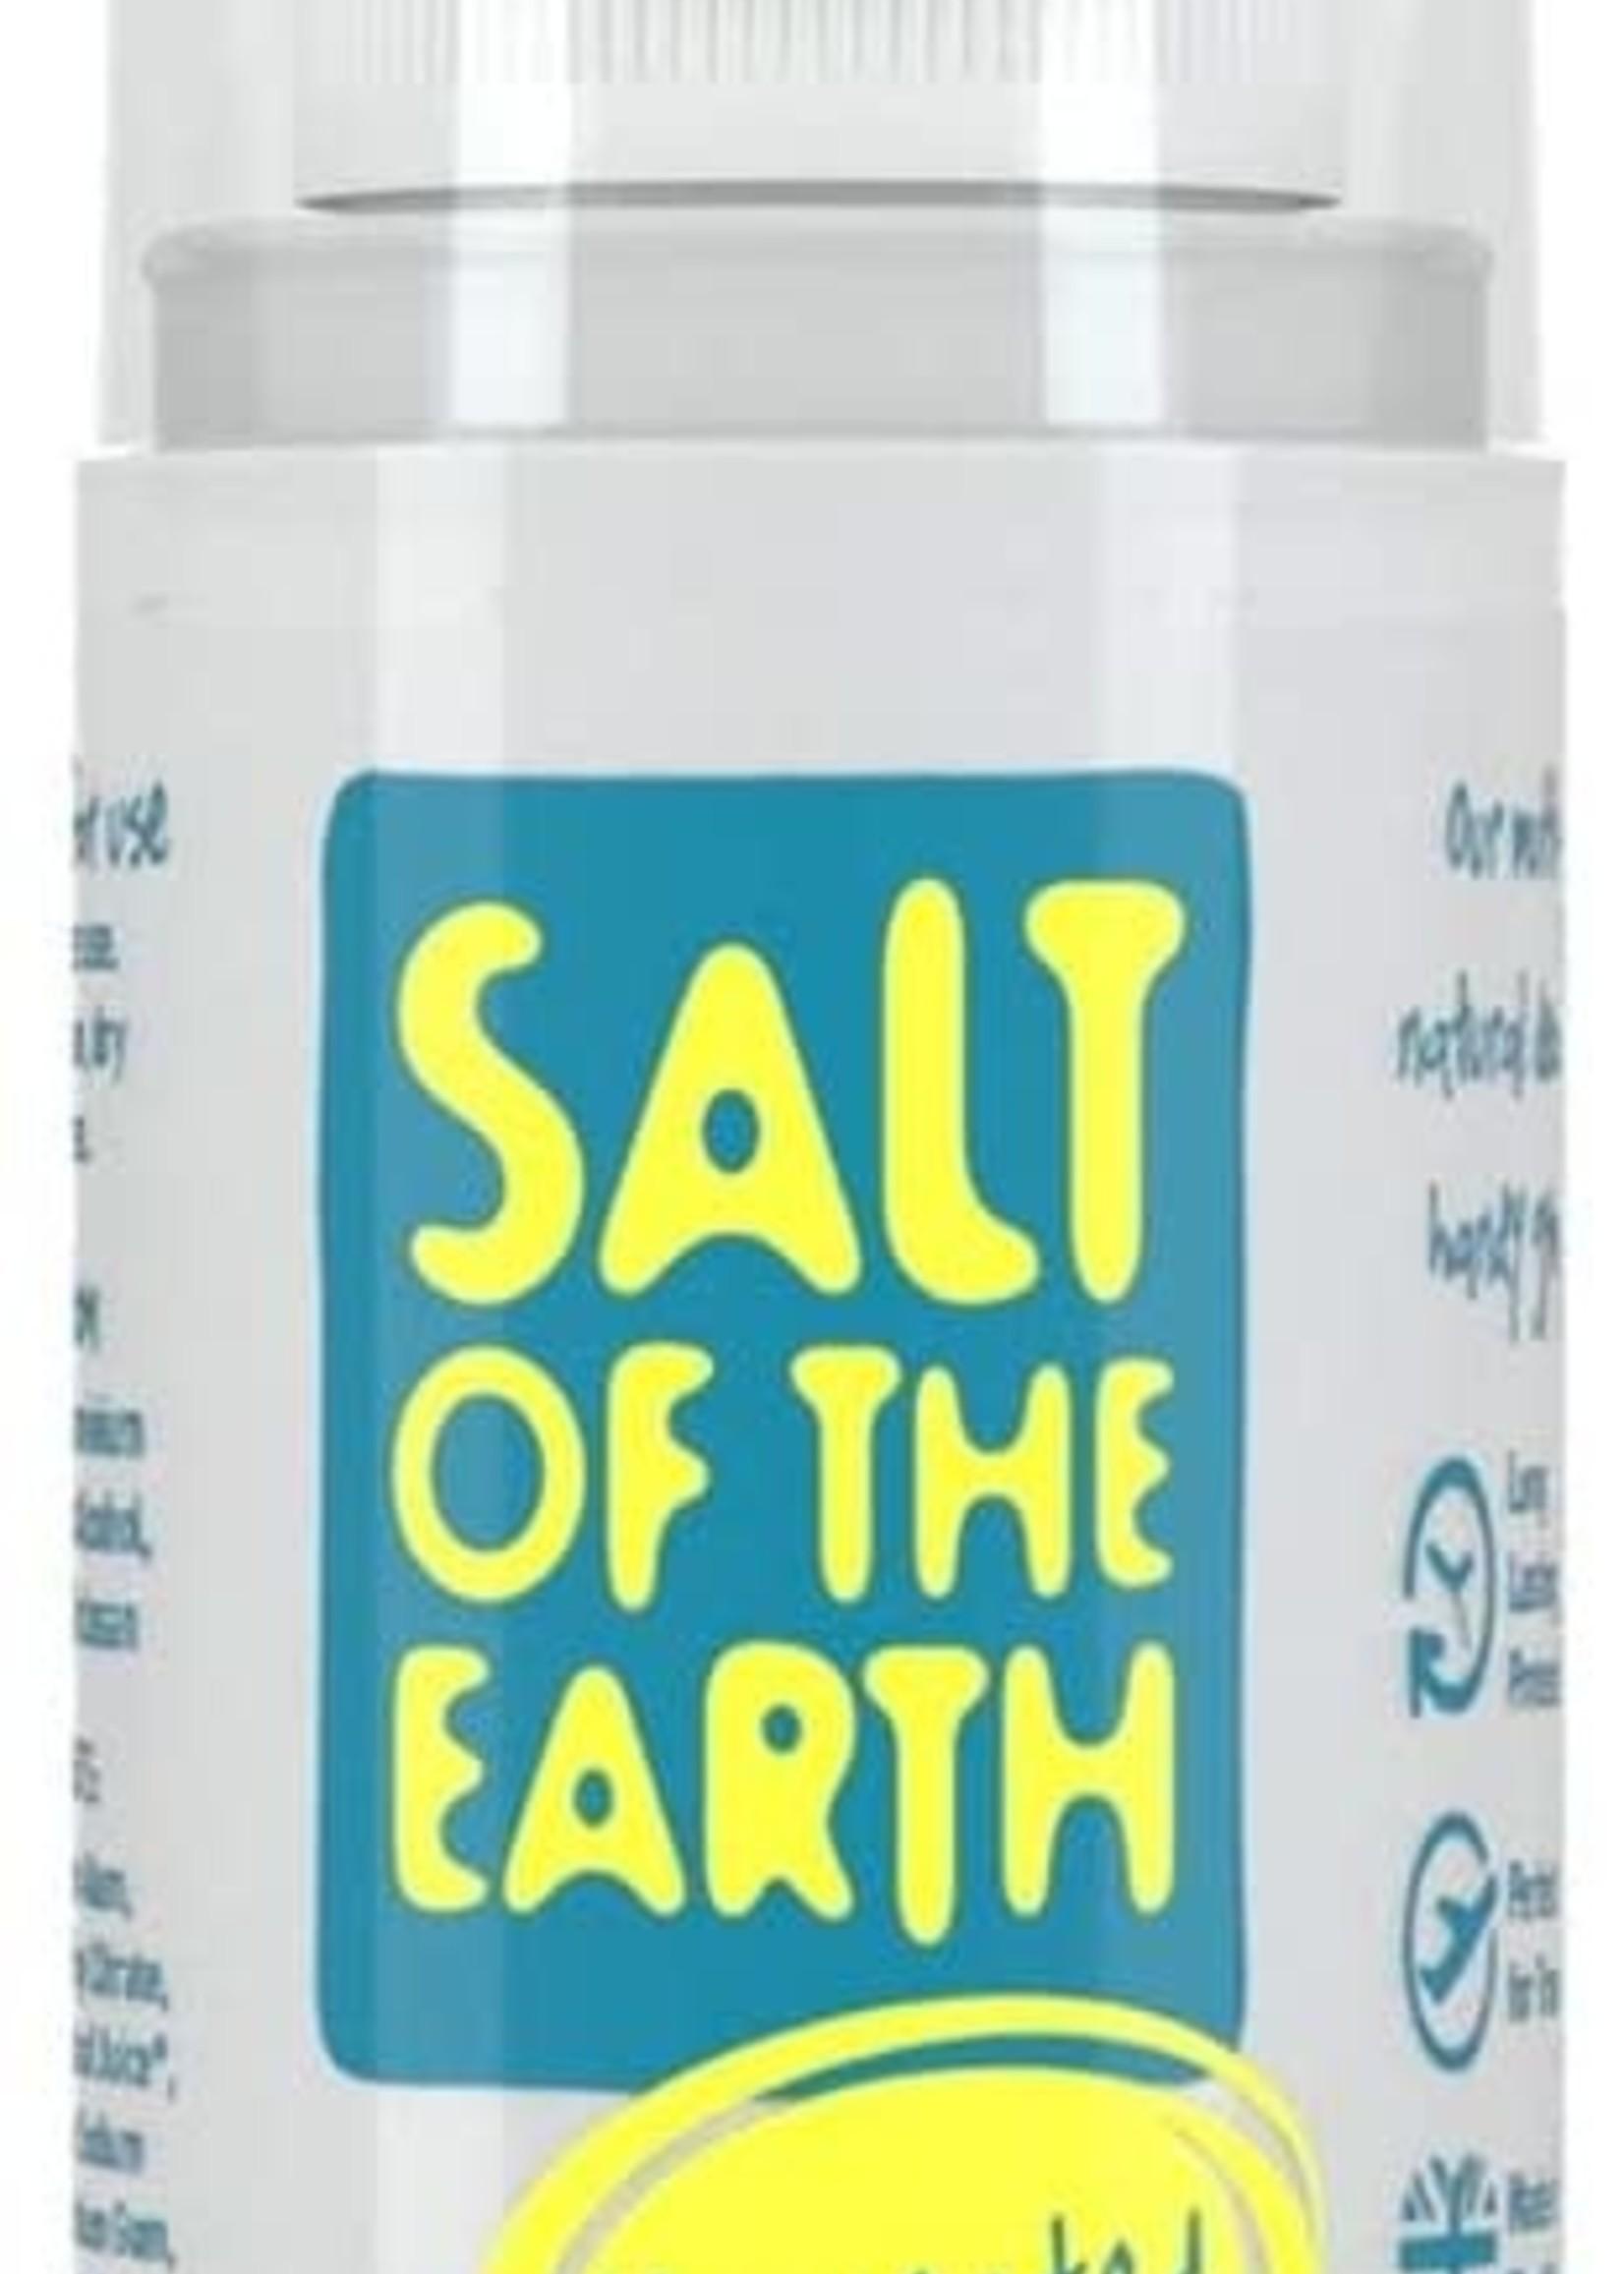 Deodorant travel spray - unscented